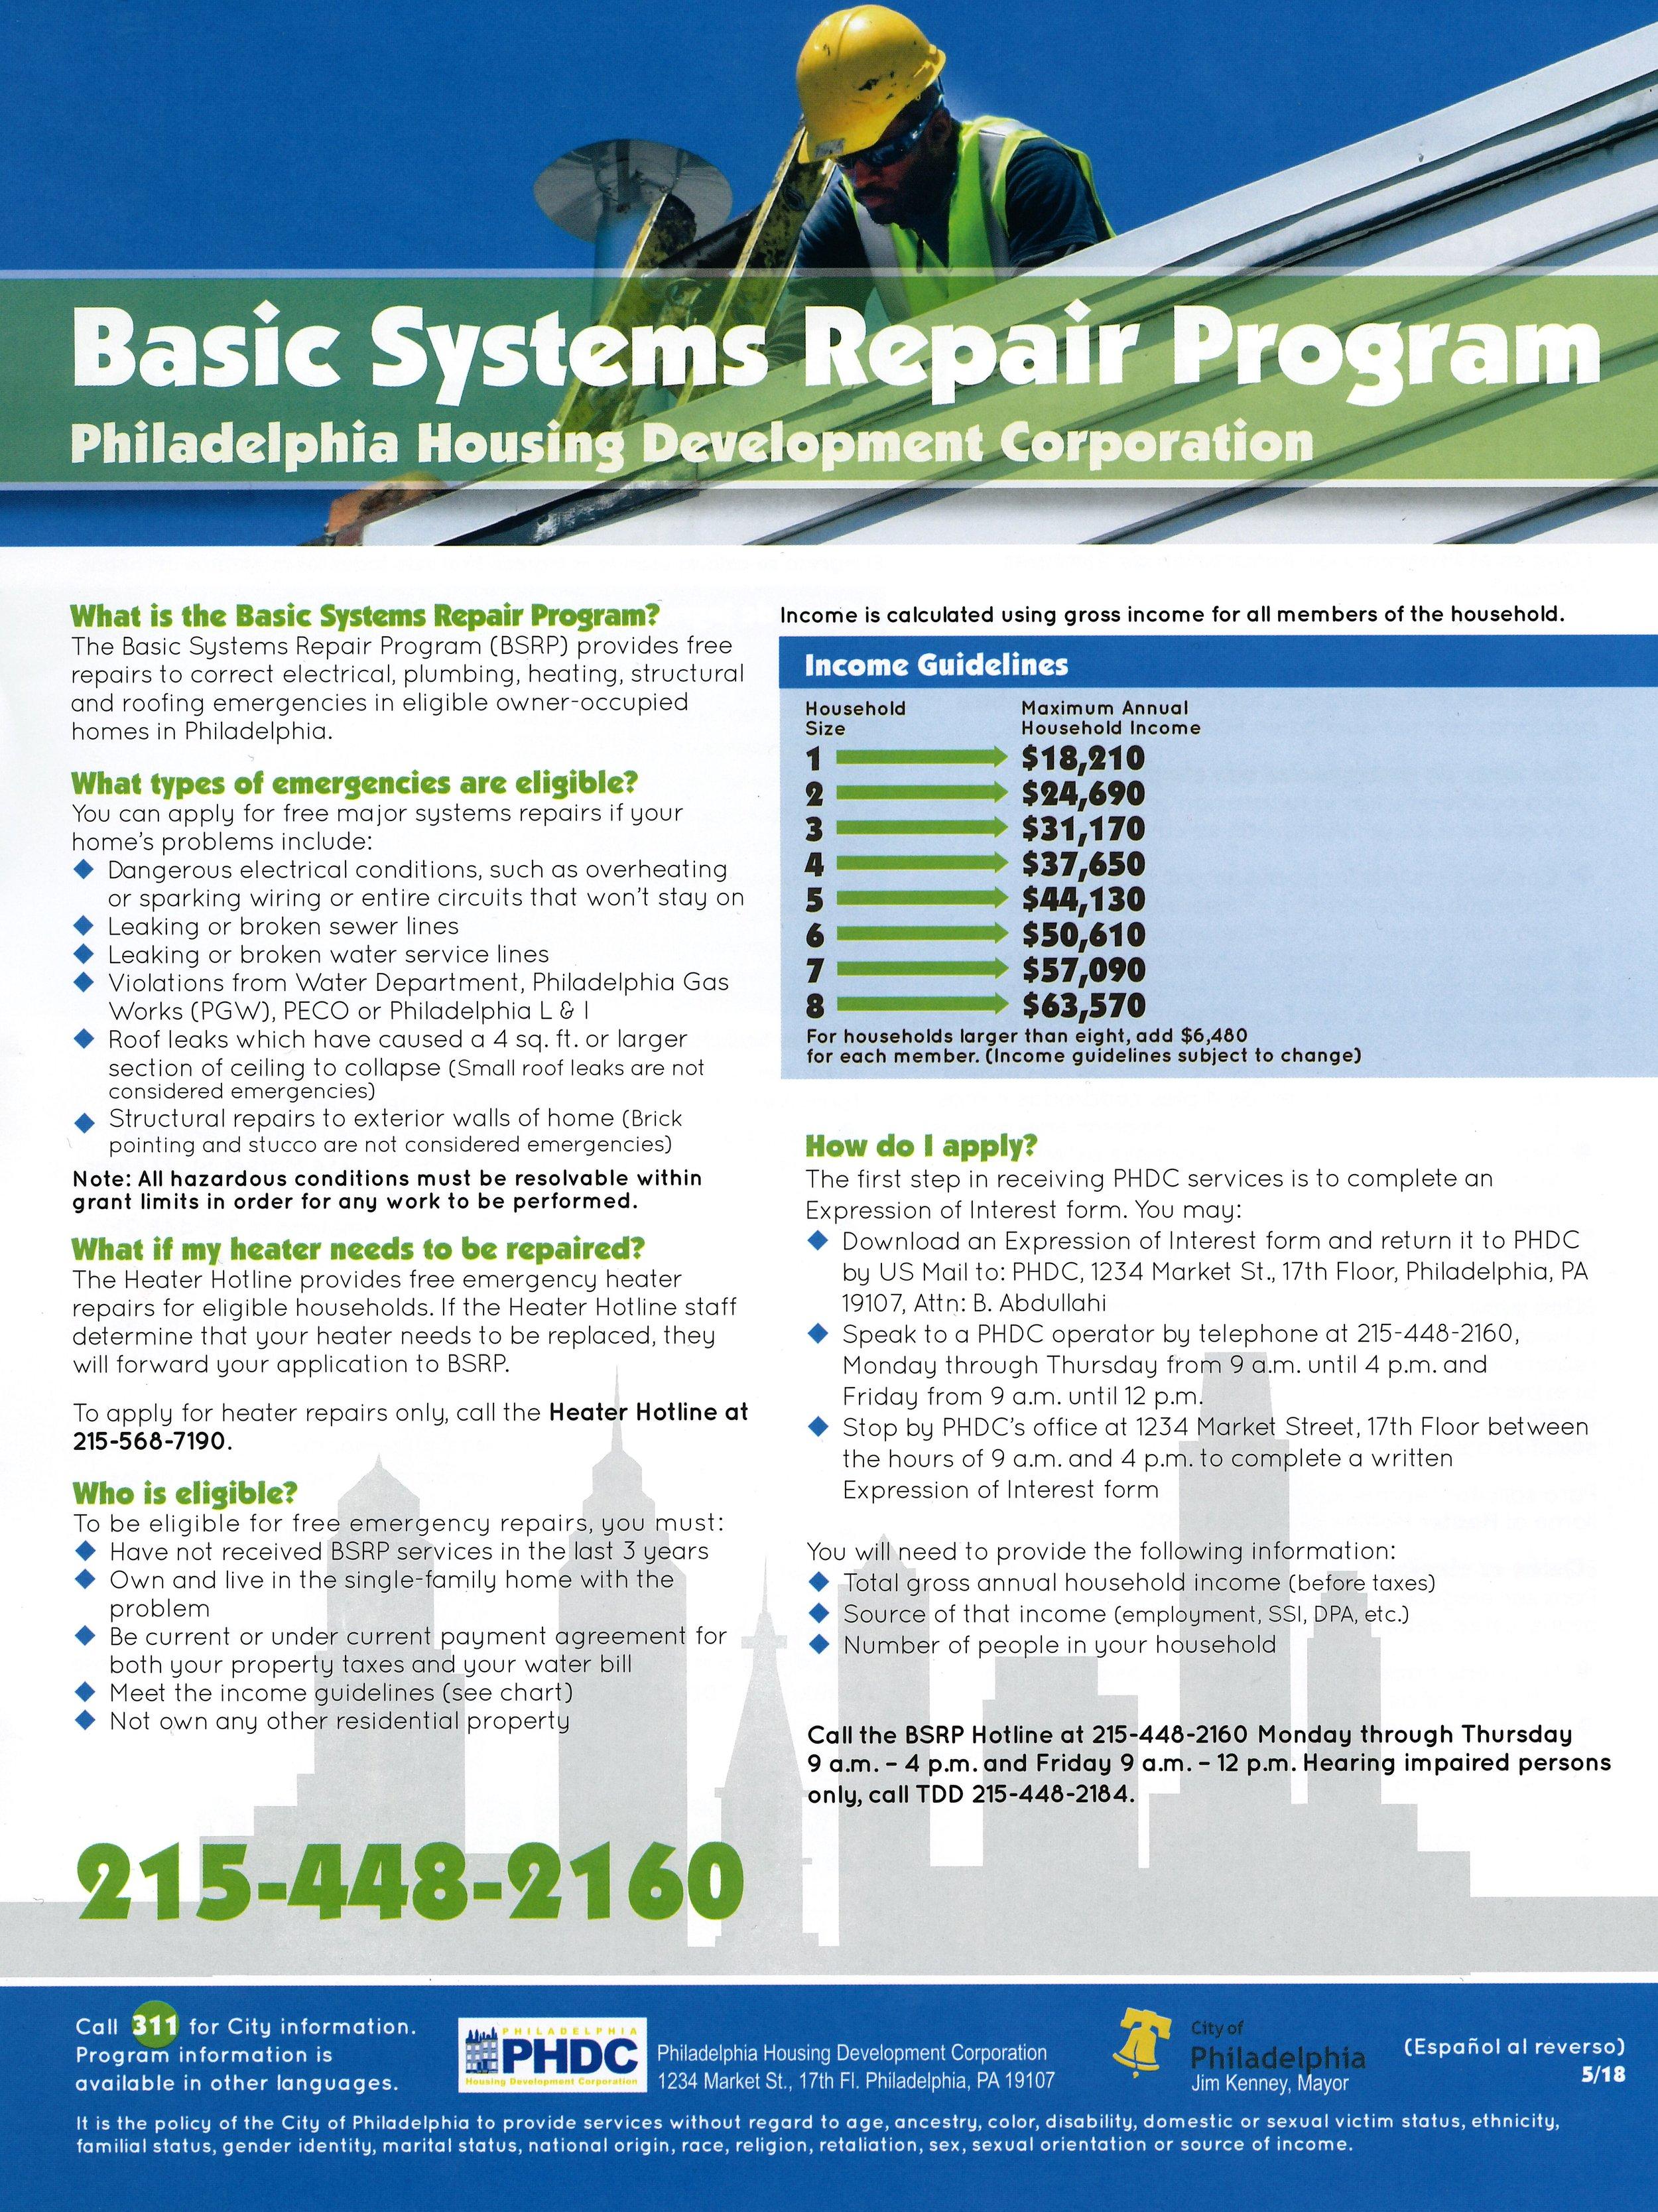 Basic system reapair program.jpg